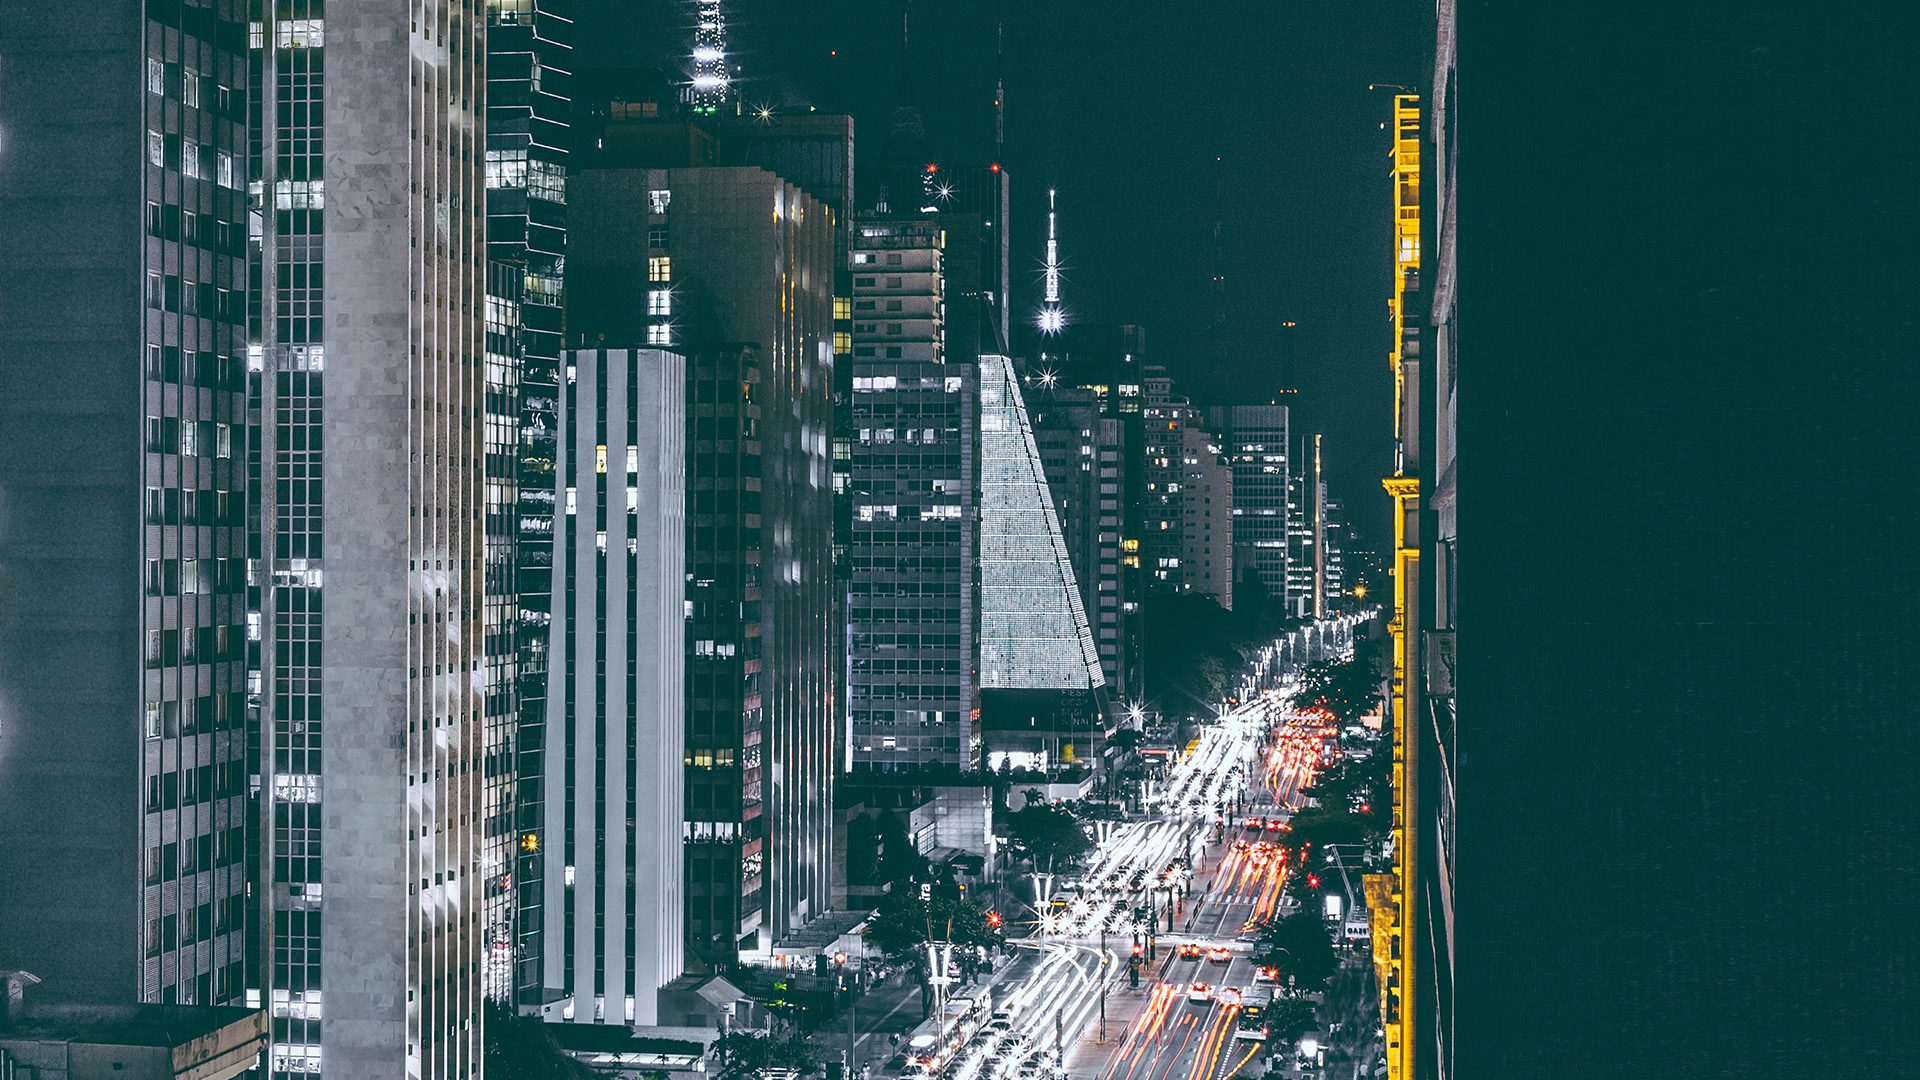 wallpaper for desktop, laptop | nf05-city-night-view-urban ...